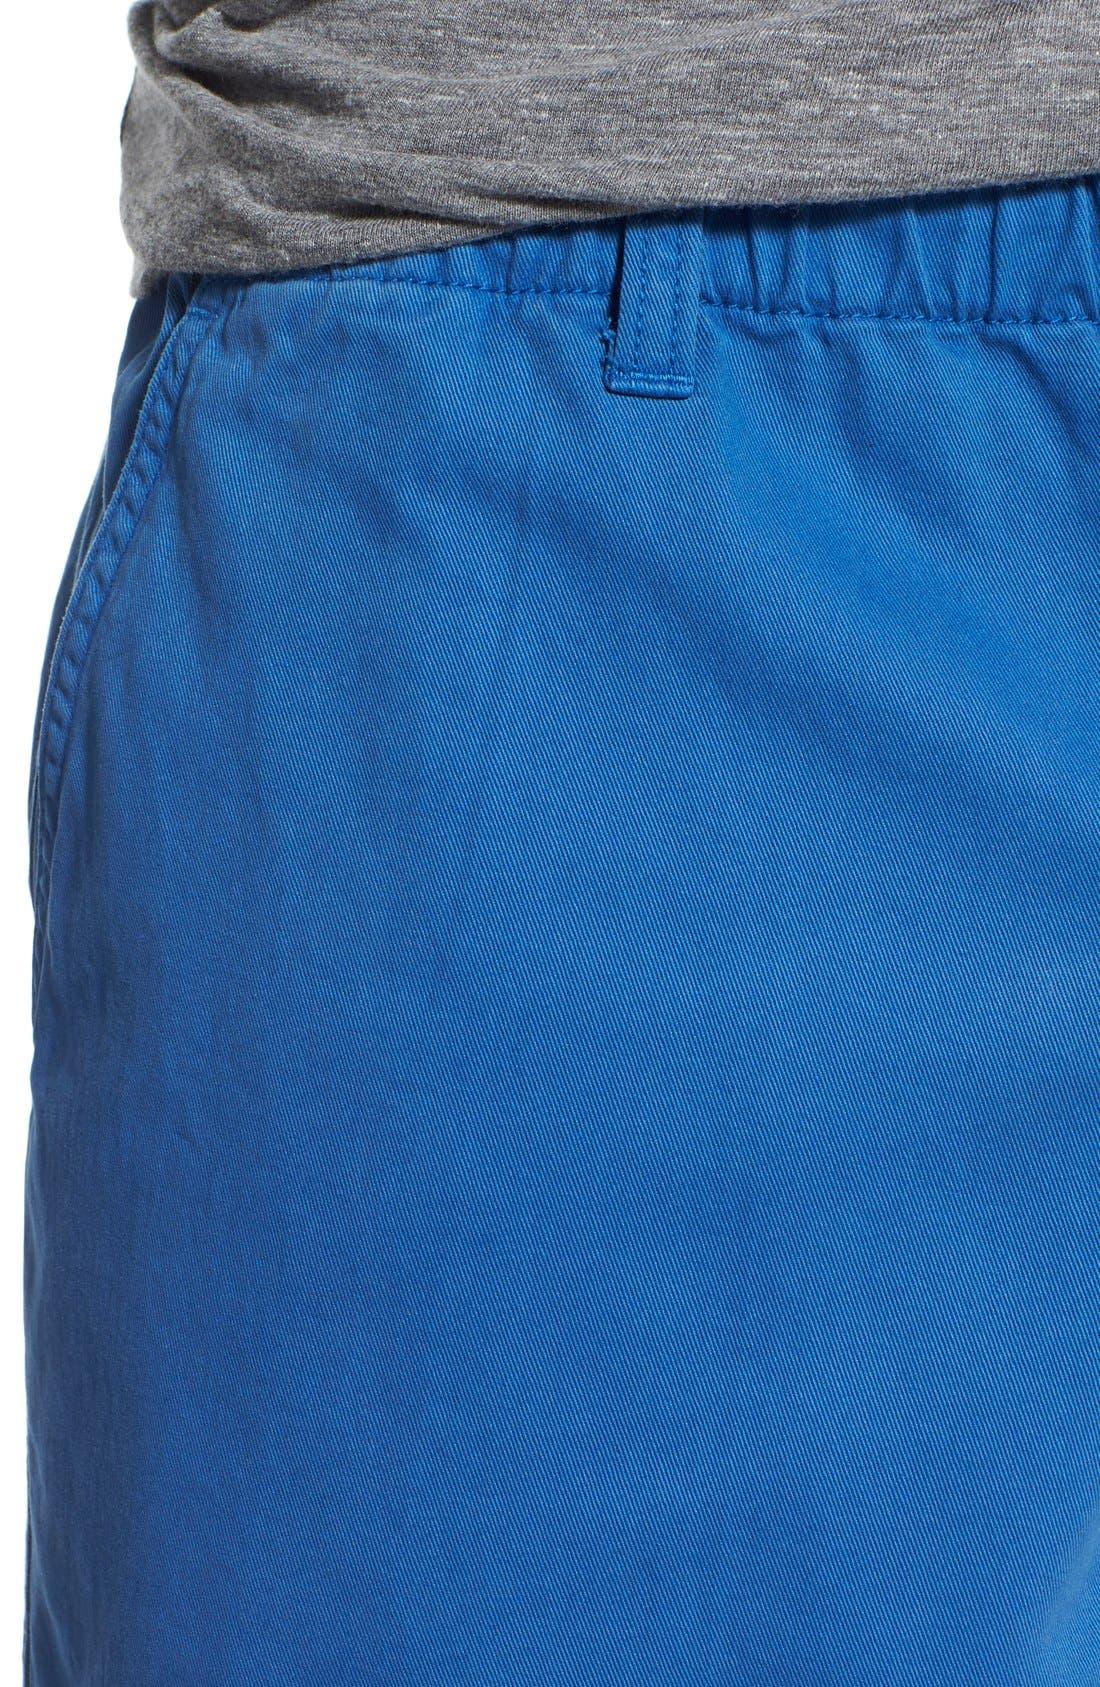 Alternate Image 4  - Vintage 1946 'Snappers' Vintage Washed Elastic Waistband Shorts